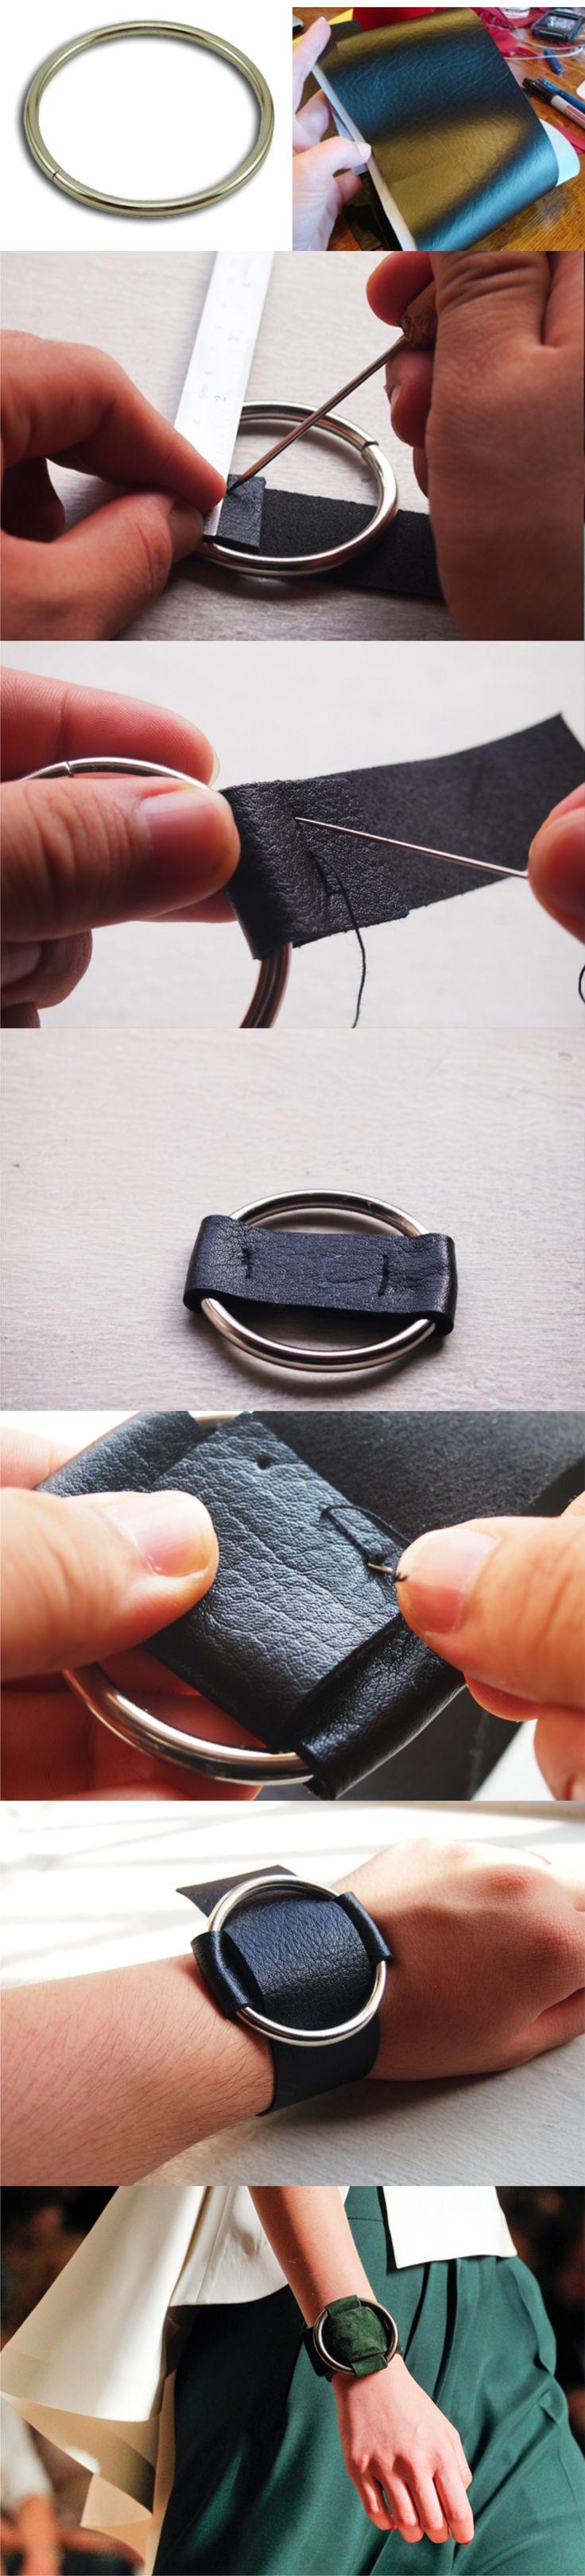 Ingeniosa pulsera a partir de un aro y tiras de piel / Via do-or-diy.blogspot.com